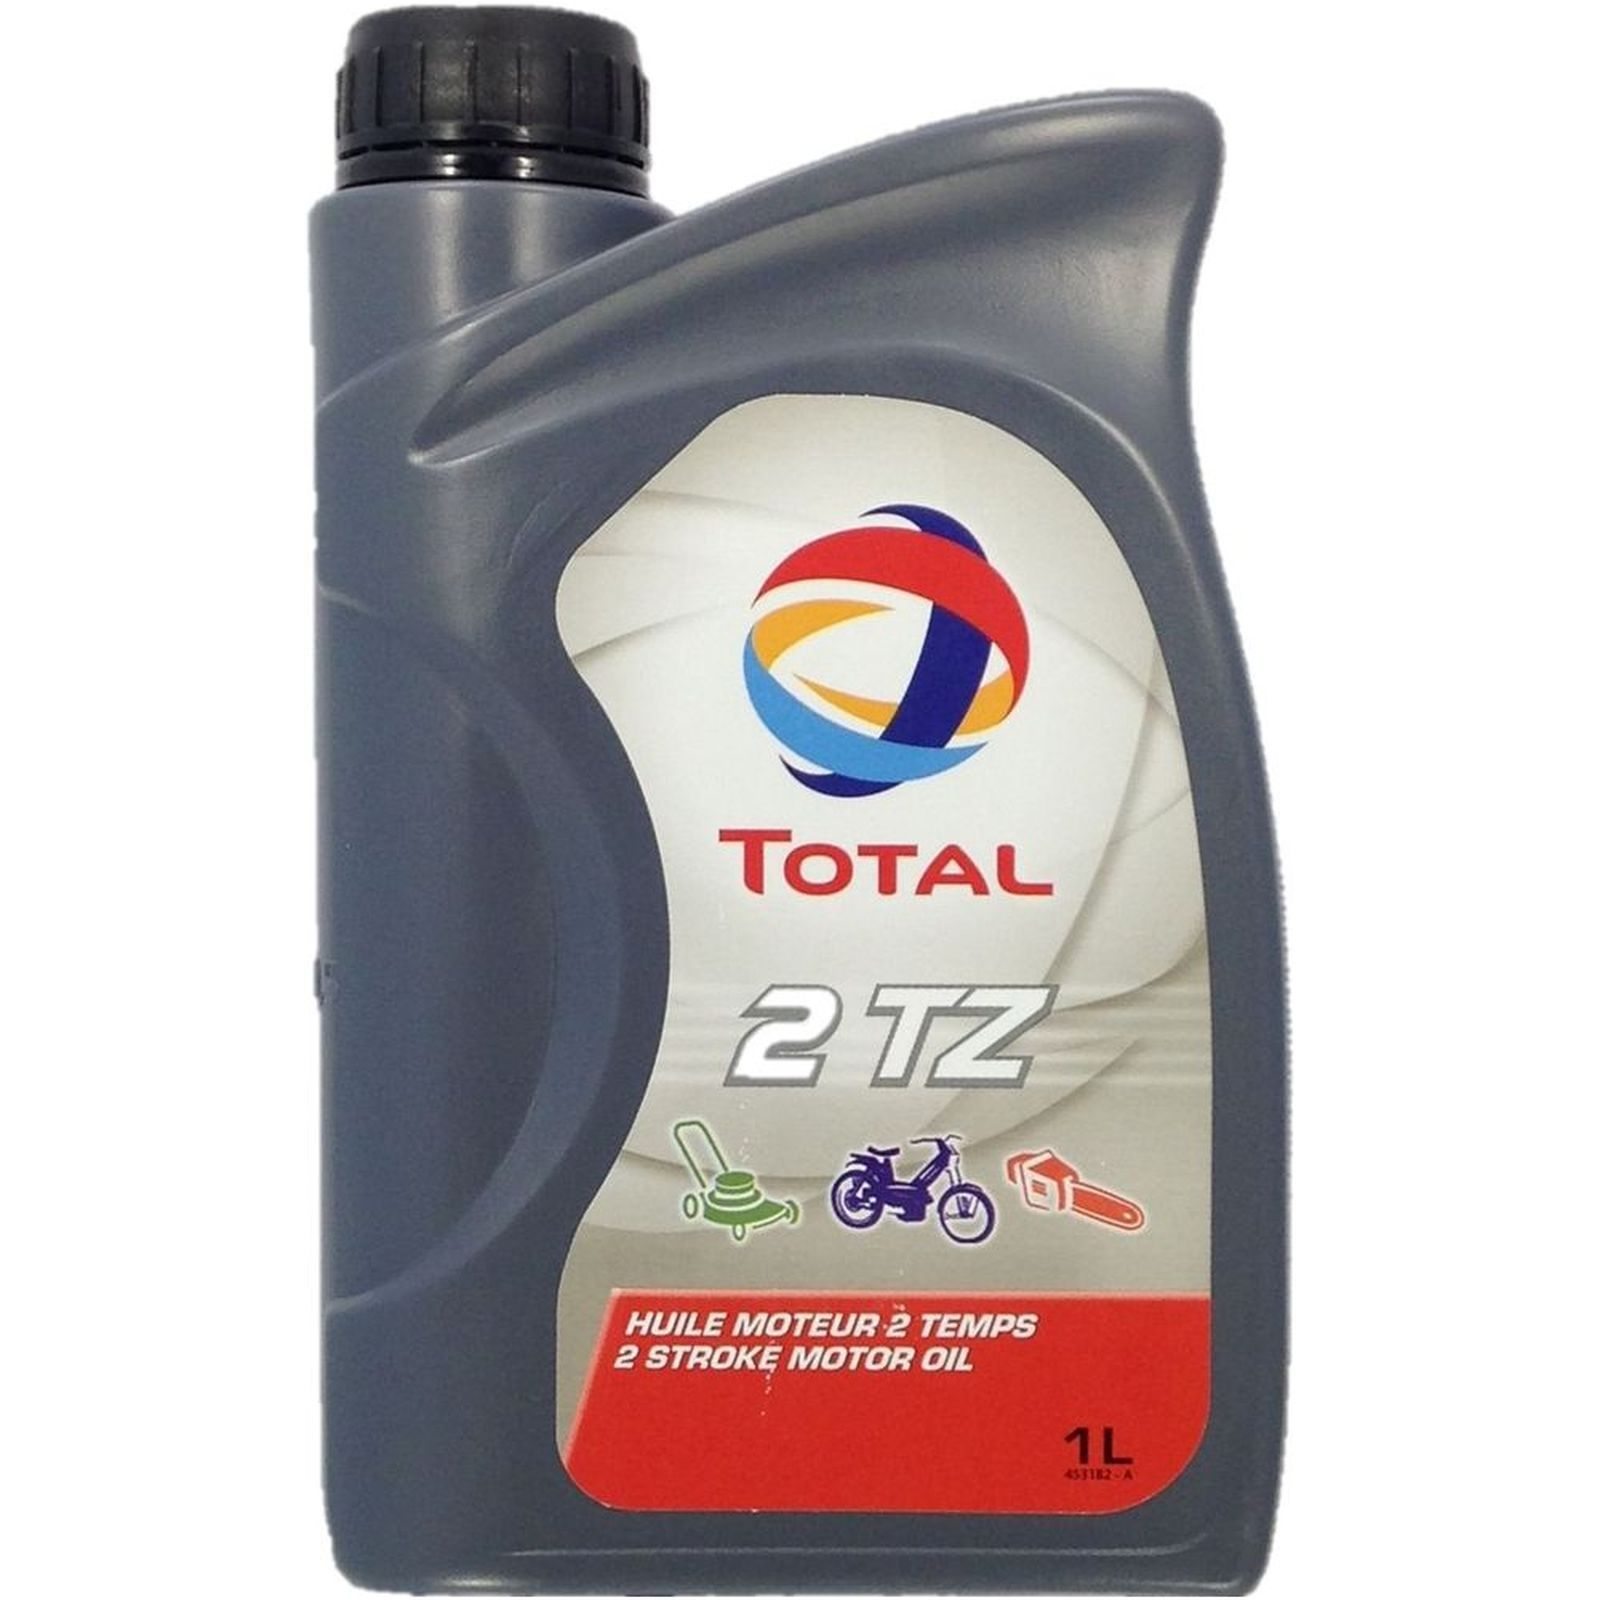 1 Liter Total 2 TZ für Rasenmäher, Motorsäge, Mofa,...